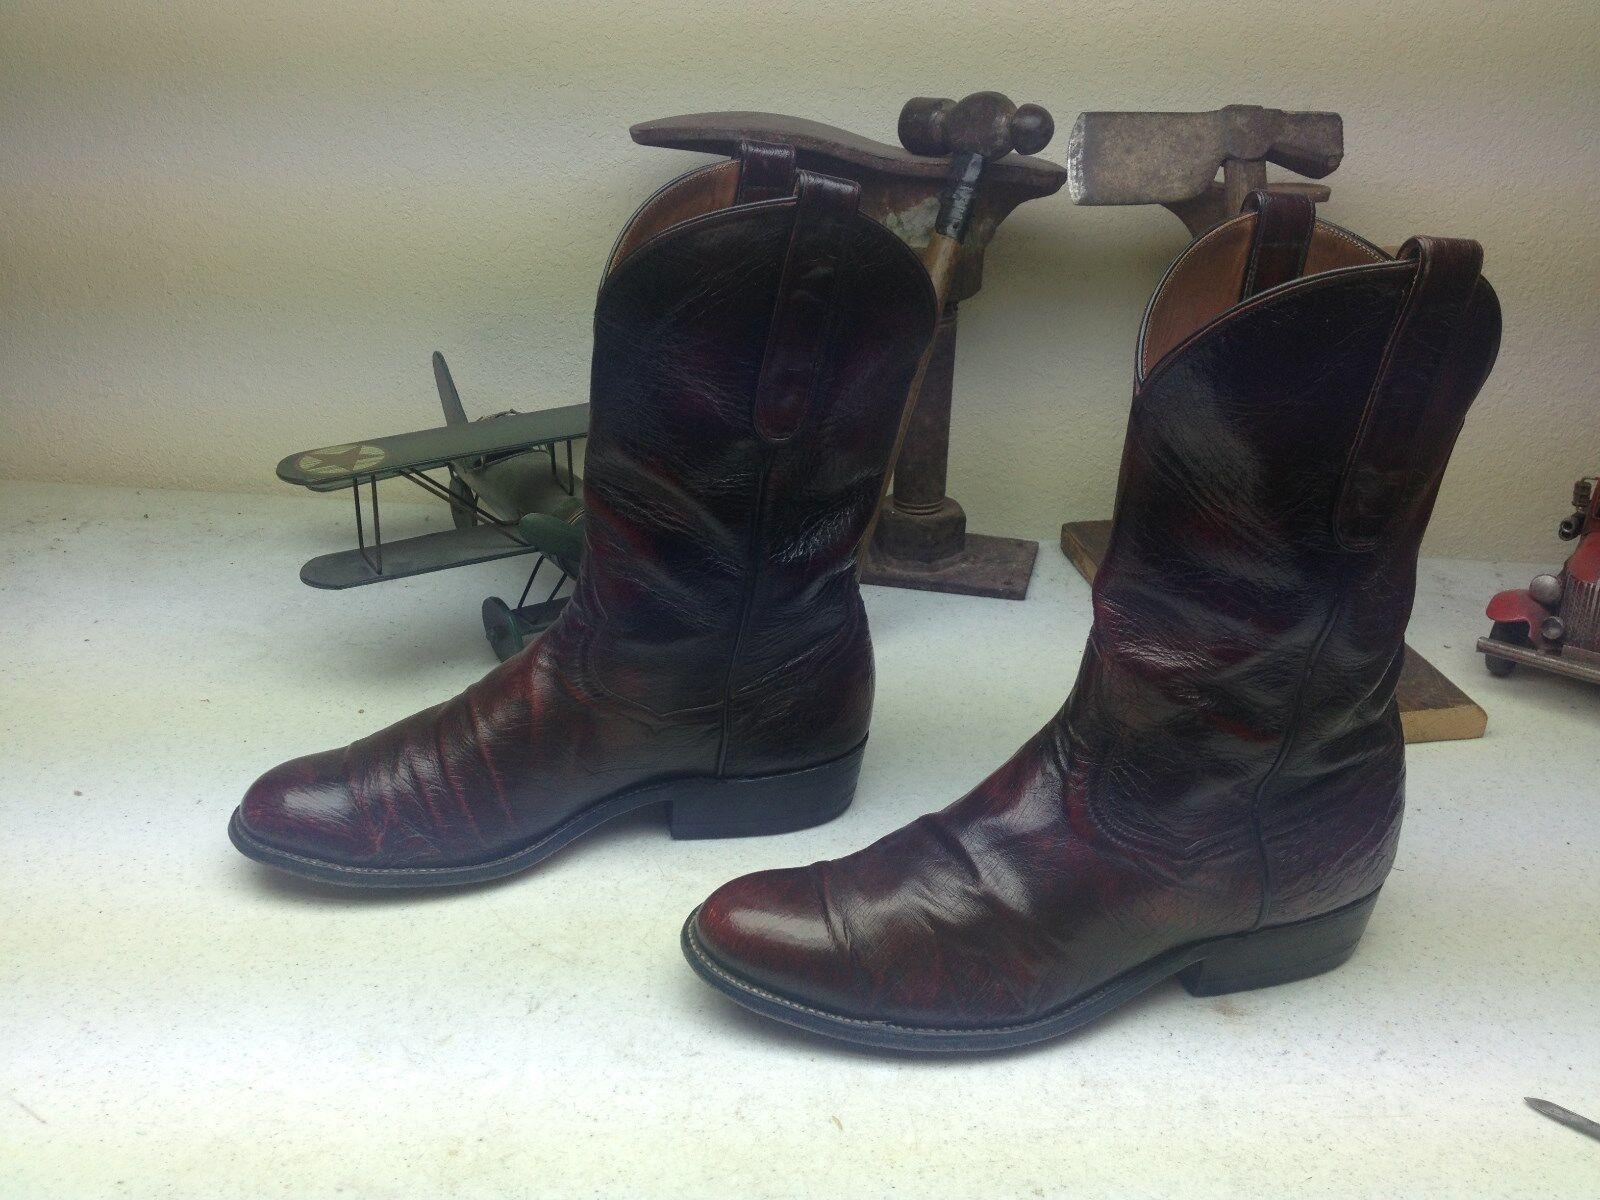 John Wesley Hardin envejecido Avestruz Cuero Ingeniero Trail Boss botas 9-9,5 m